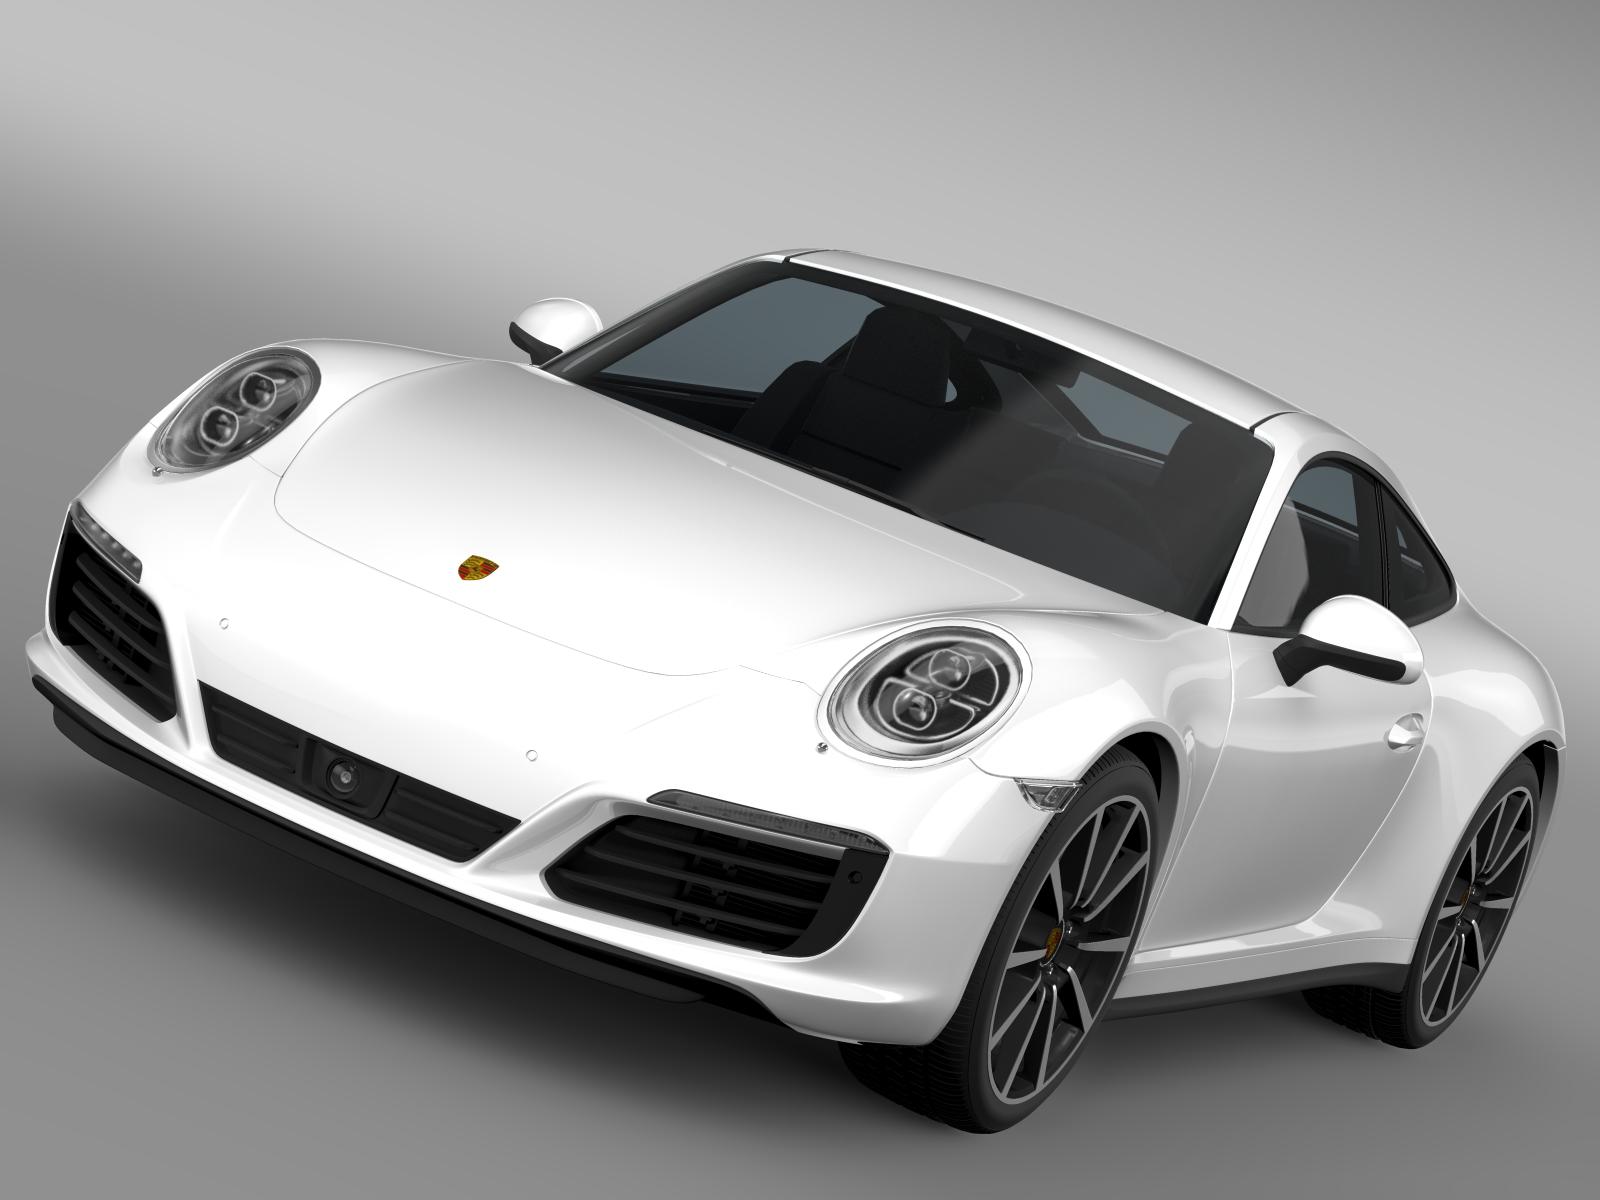 porsche 911 carrera 4s coupe 991 2016 3d model buy porsche 911 carrera 4s coupe 991 2016 3d. Black Bedroom Furniture Sets. Home Design Ideas